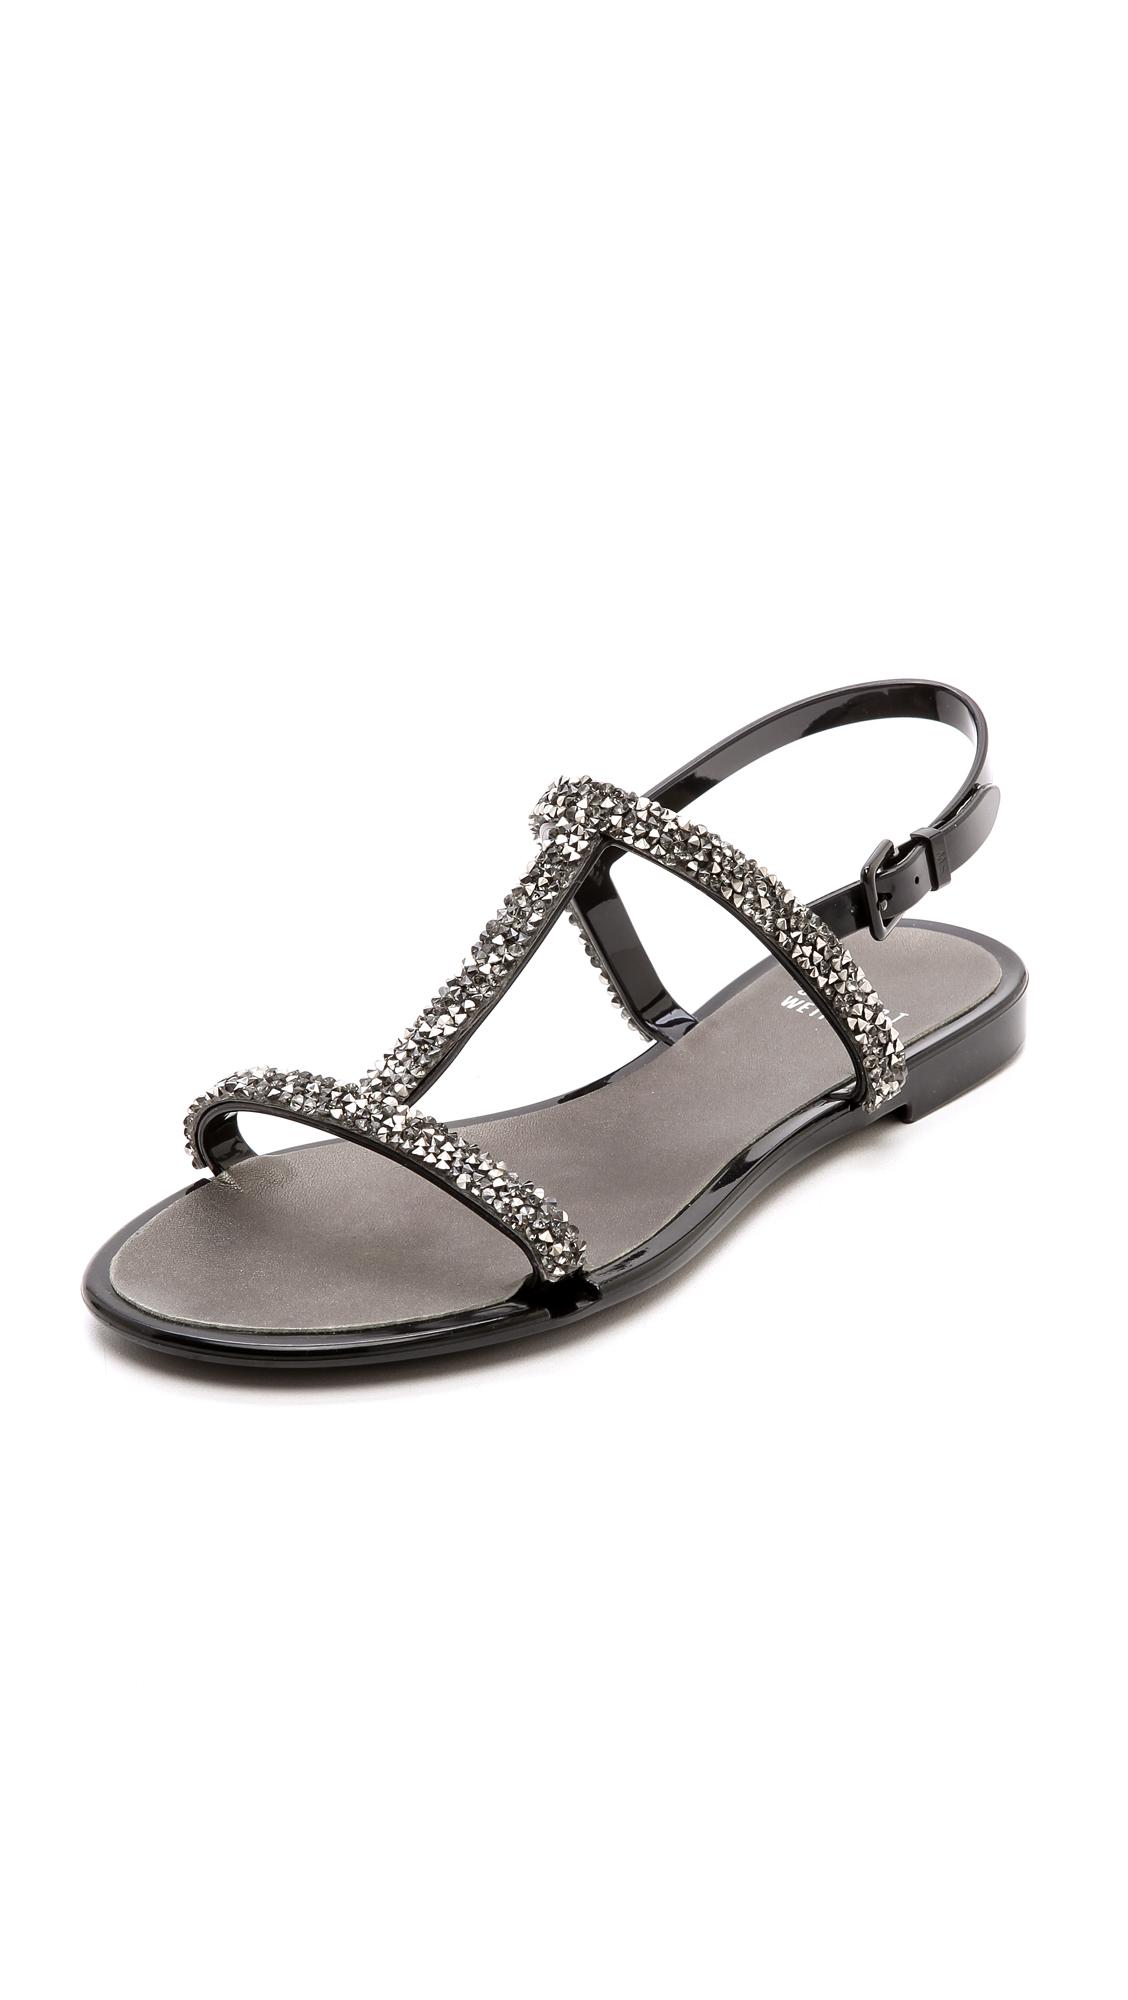 Stuart Weitzman Teezer Glitter T Strap Jelly Sandals In